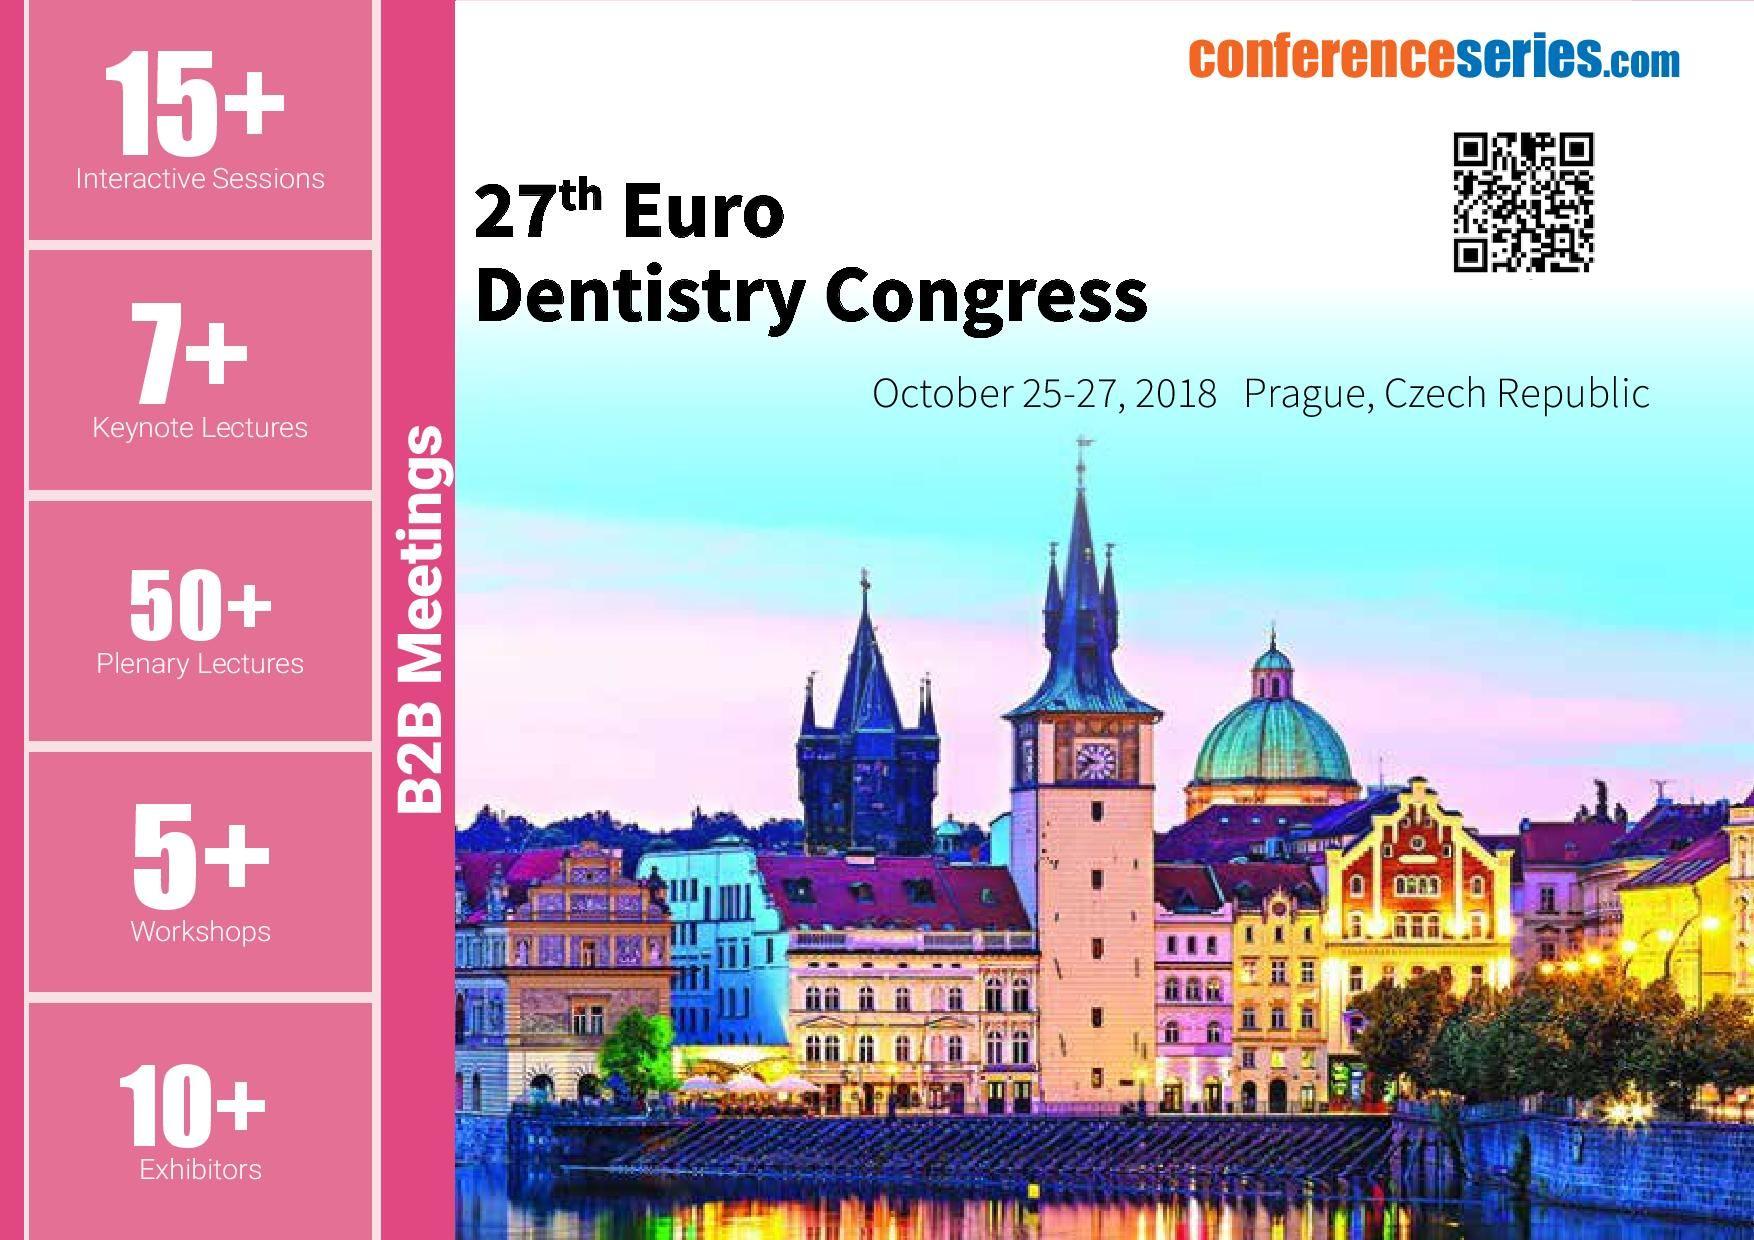 27th Euro Dentistry Congress October 2527 2018 Prague